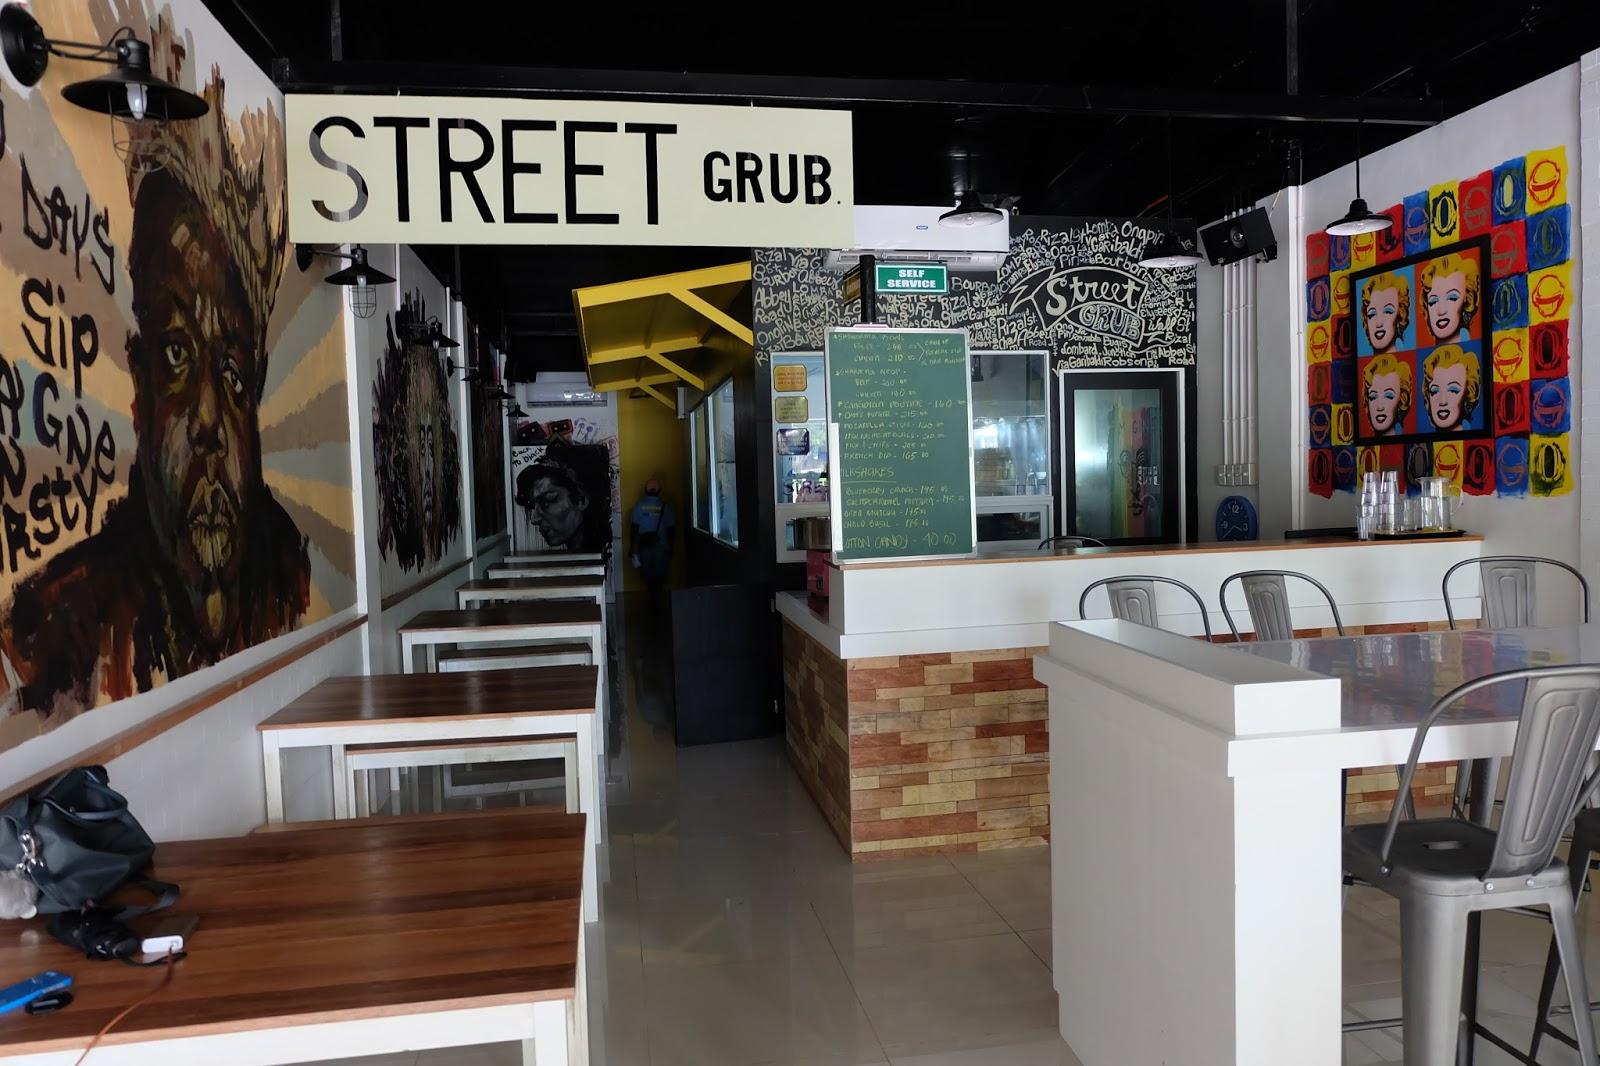 Street Grub